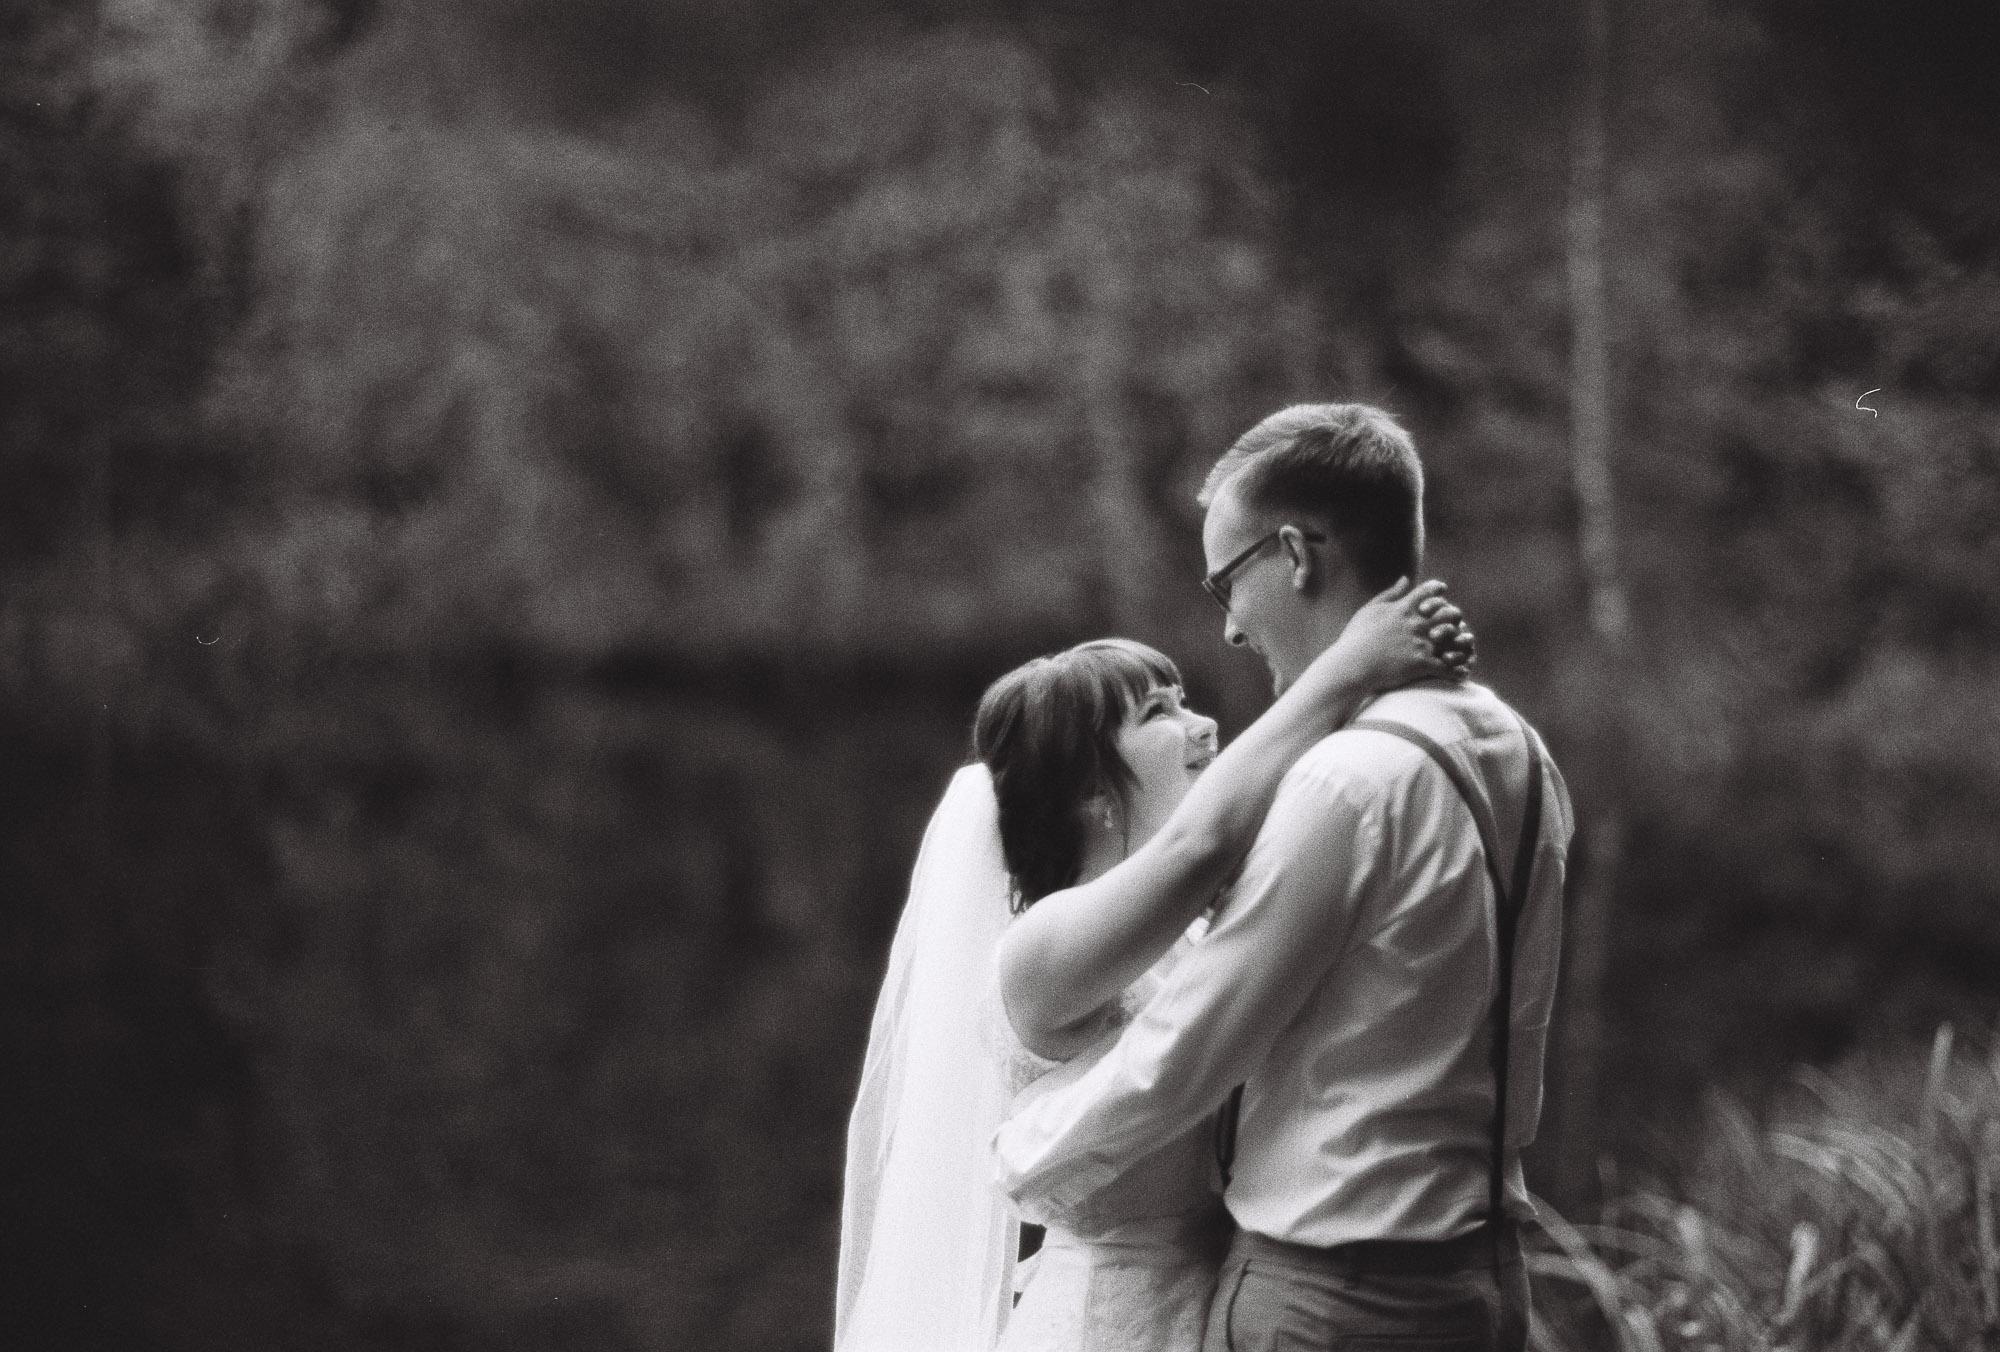 jere-satamo-analog-film-wedding-photographer-finland-107.jpg